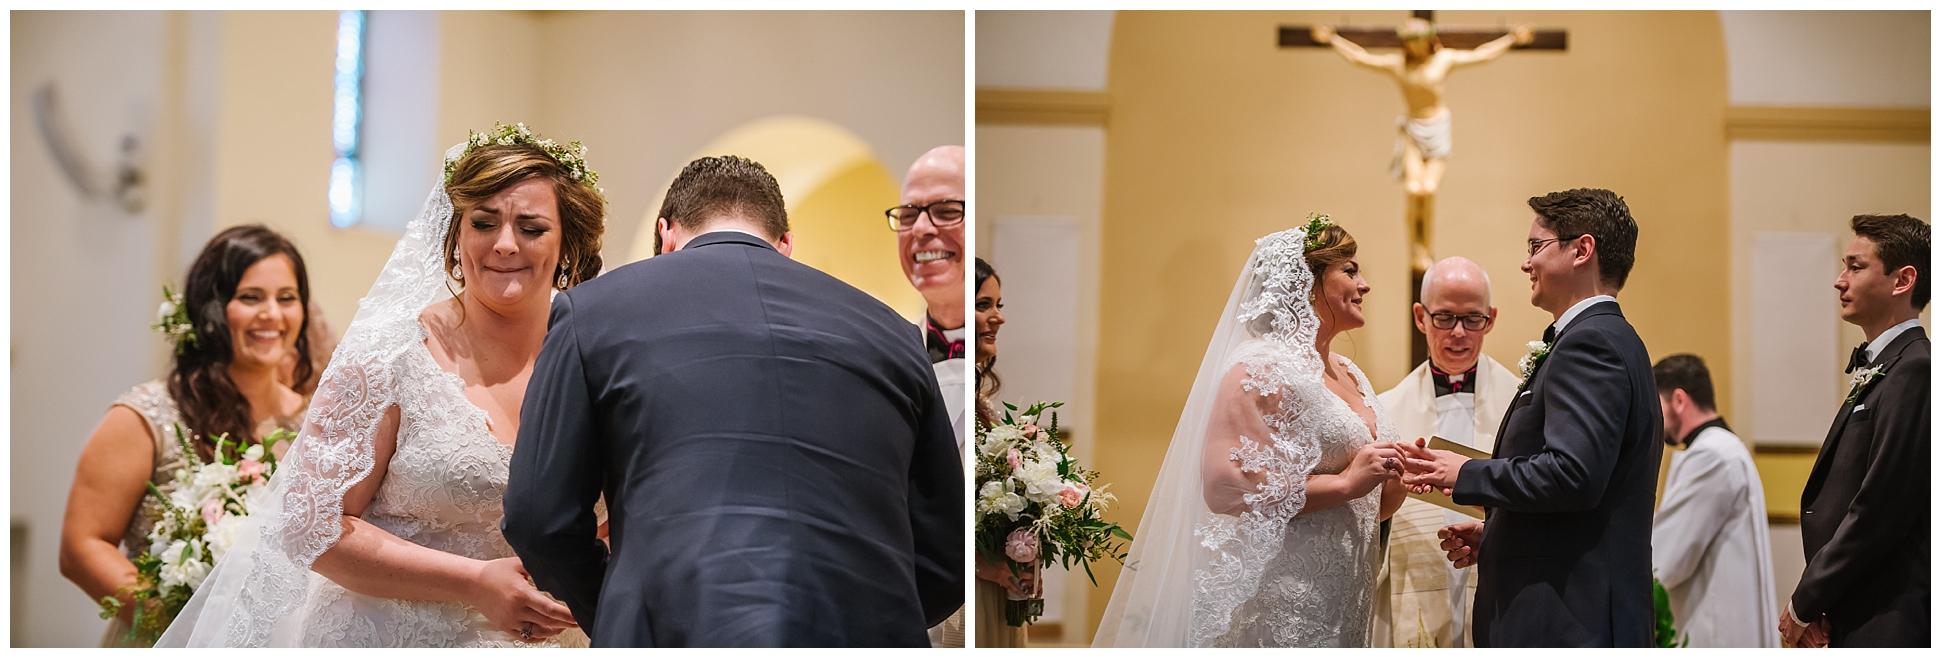 st-pete-wedding-photographer-italian-romance-theme-rustic-flower-crown_0400.jpg